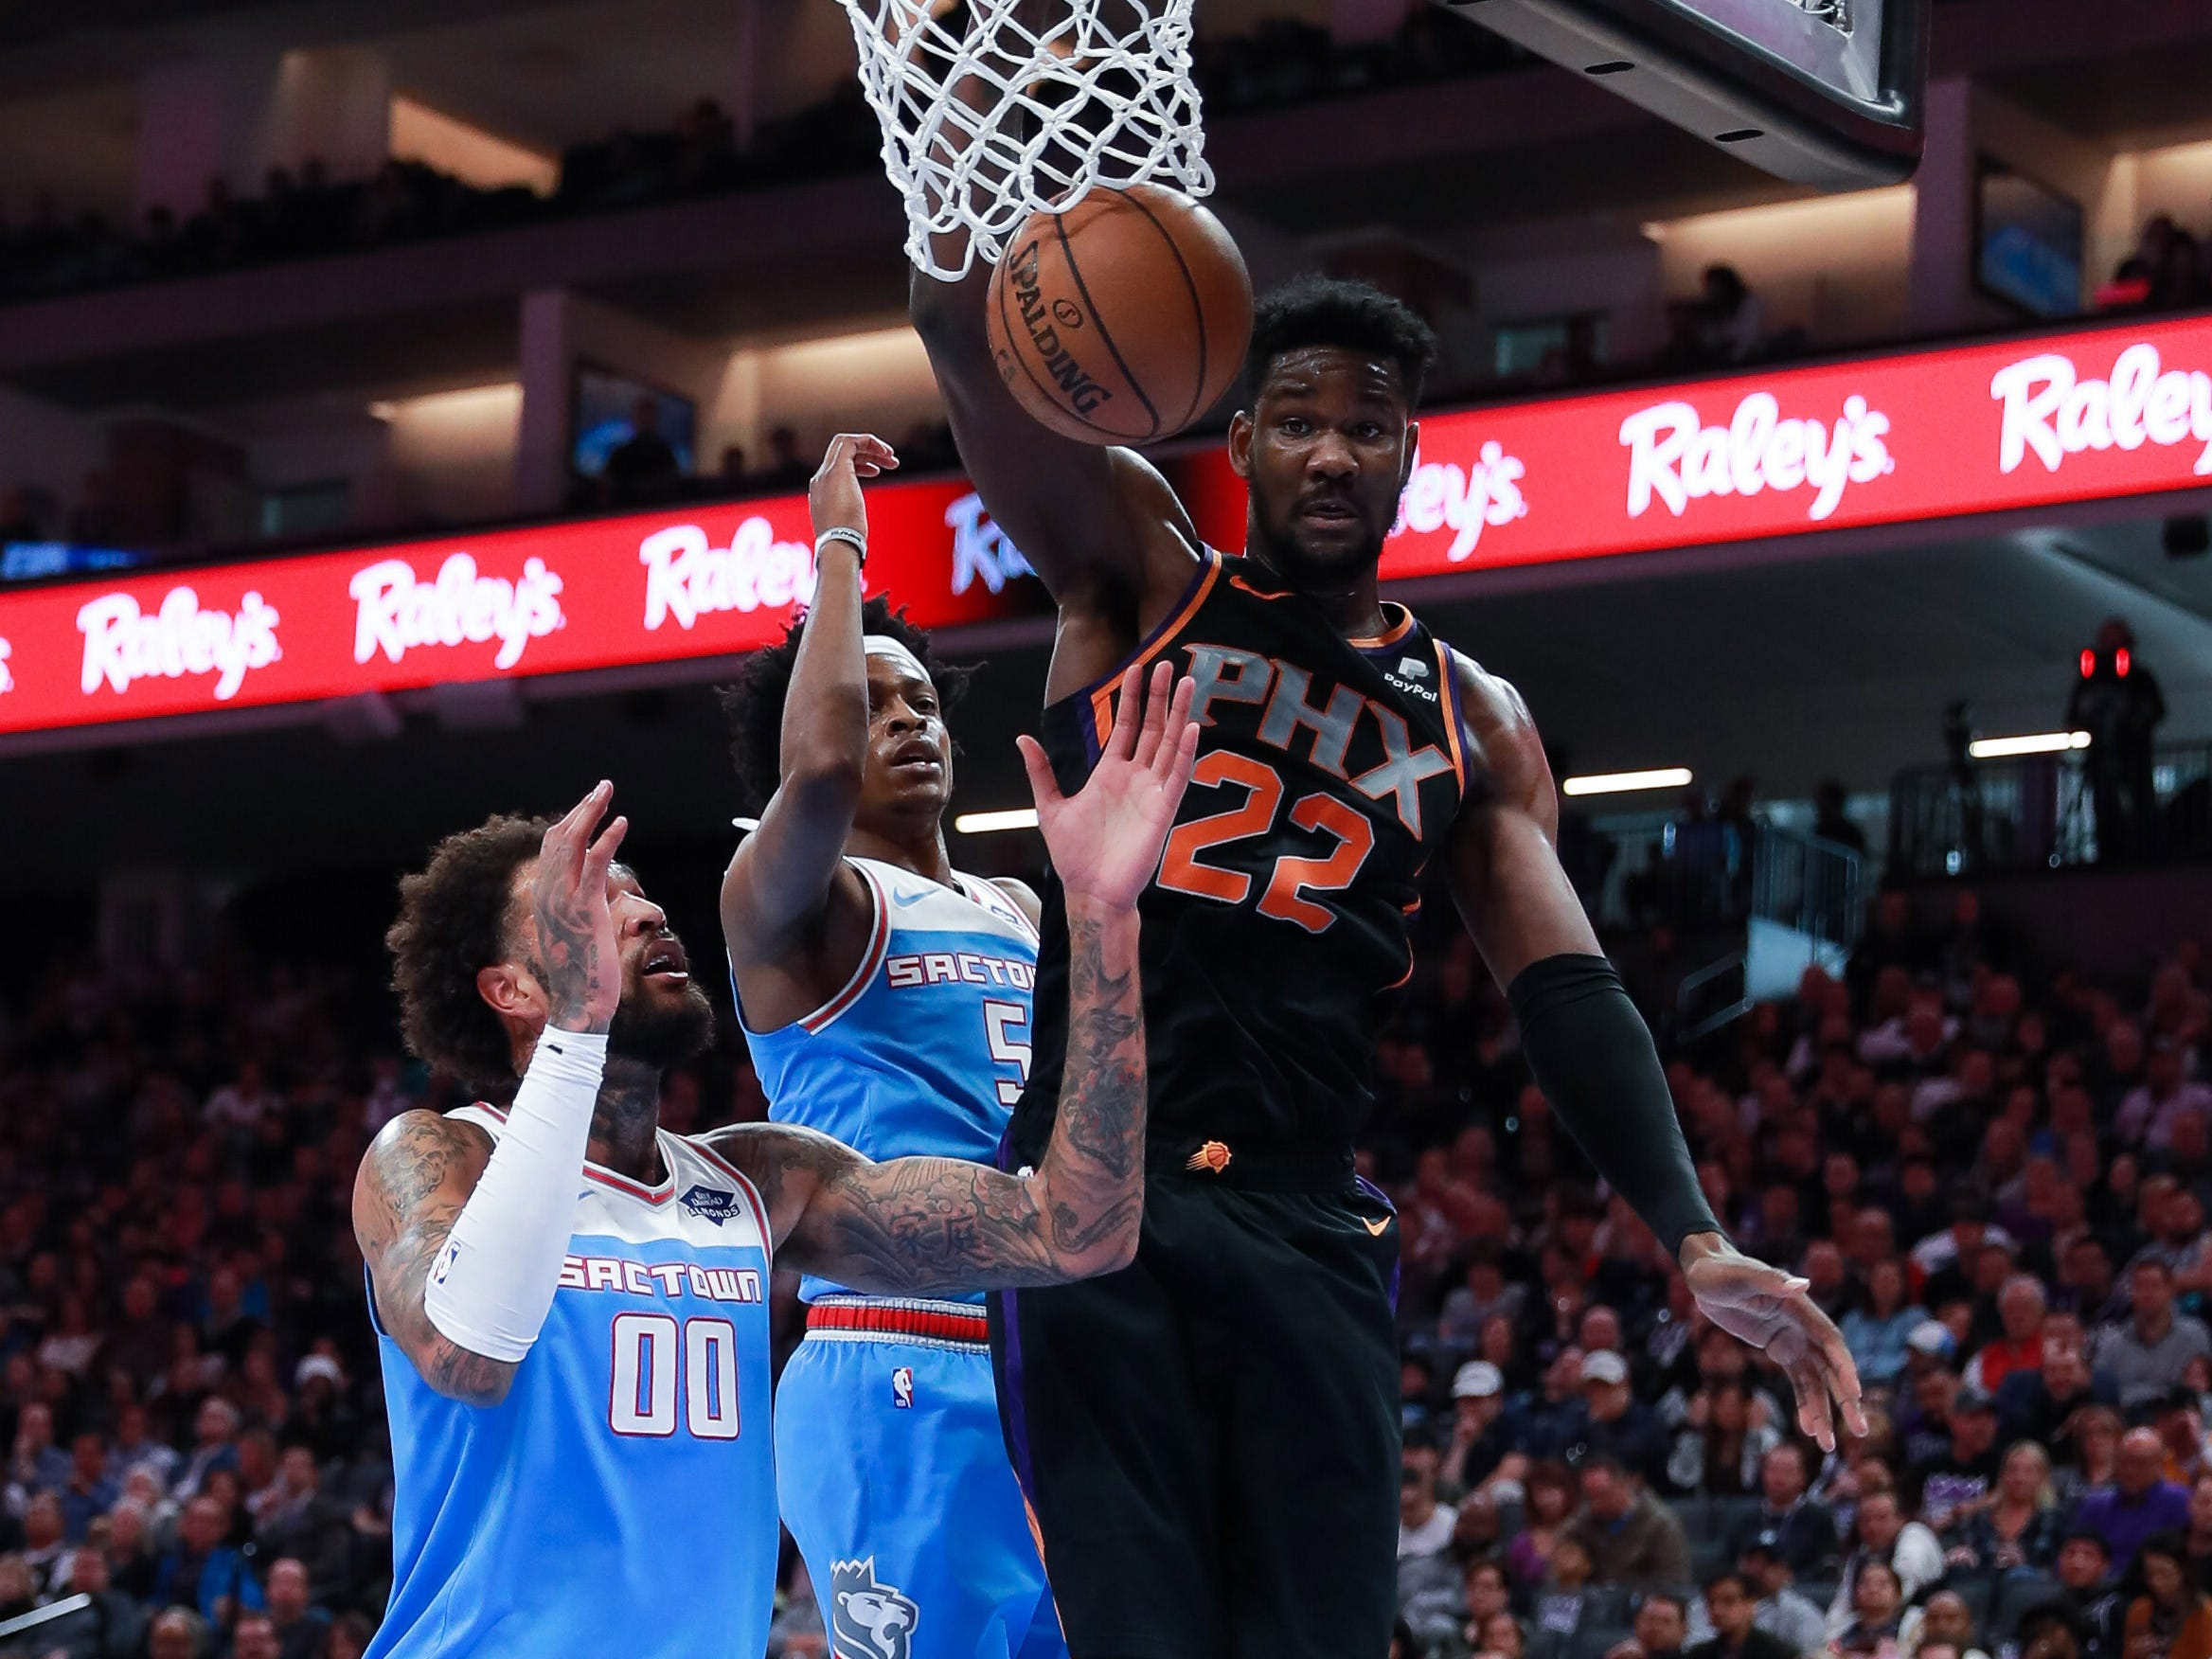 Feb 10, 2019; Sacramento, CA, USA; Phoenix Suns center Deandre Ayton (22) dunks the ball over Sacramento Kings center Willie Cauley-Stein (00) during the second quarter at Golden 1 Center.